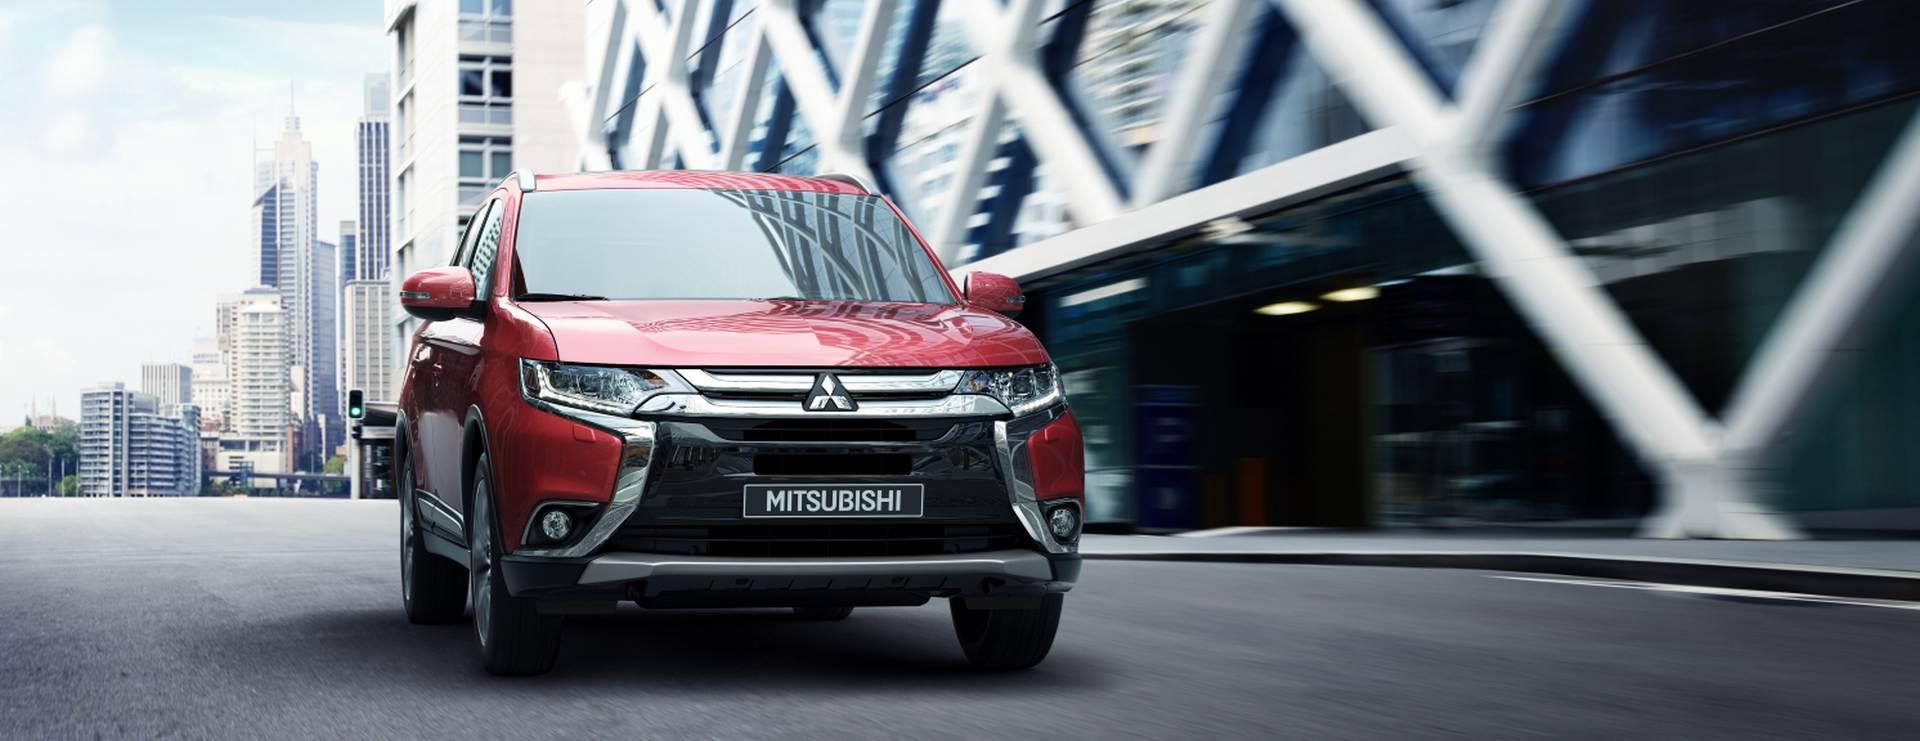 Izvrsni rezultati Mitsubishi Motorsa u EU